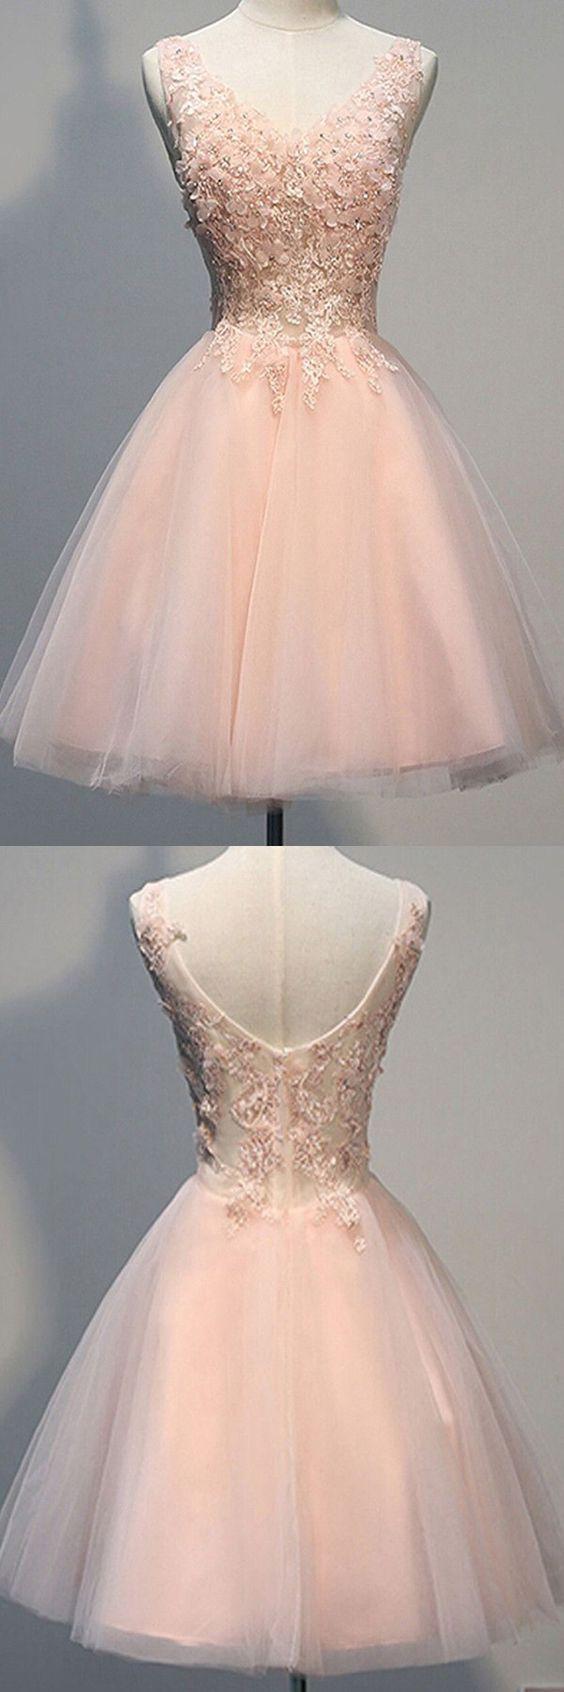 vestidos de 15 anos cortos2016 (2)